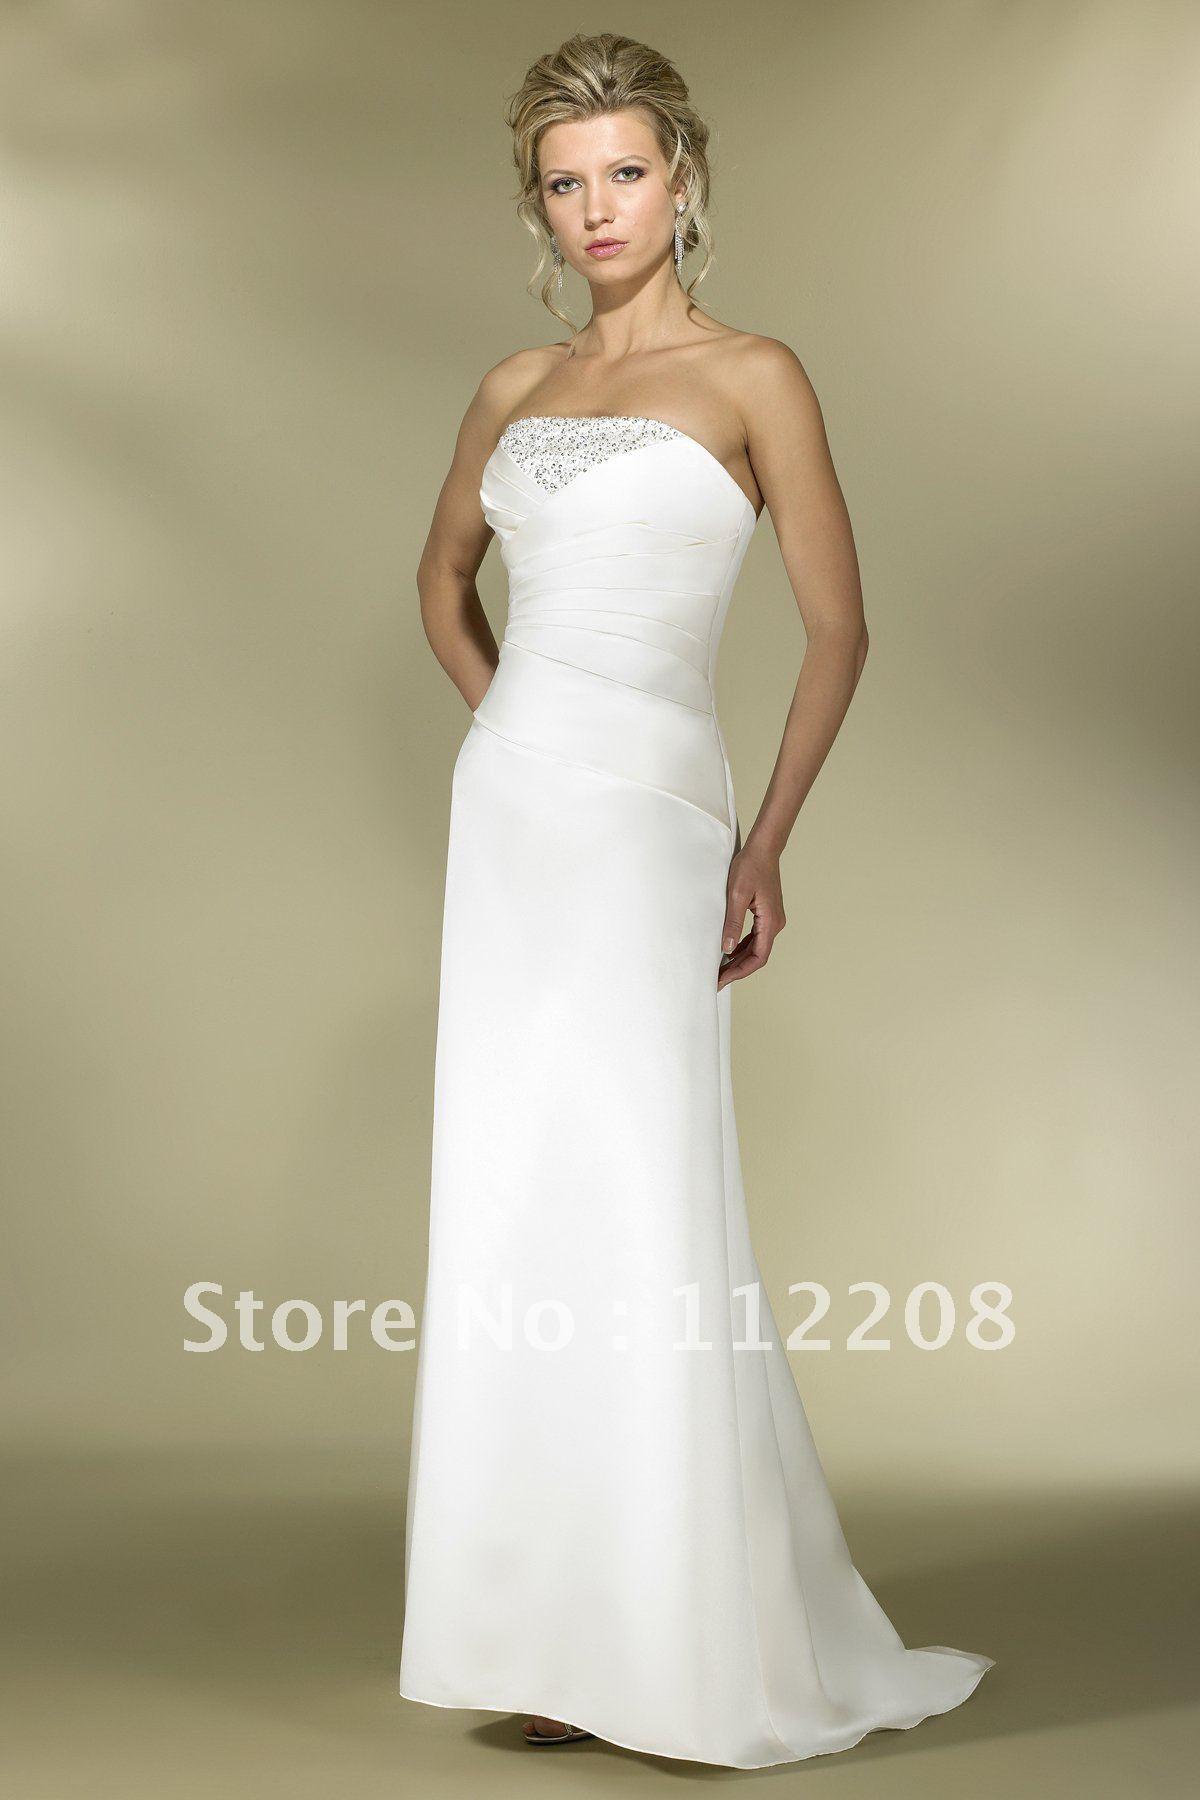 wedding dresses plain 99